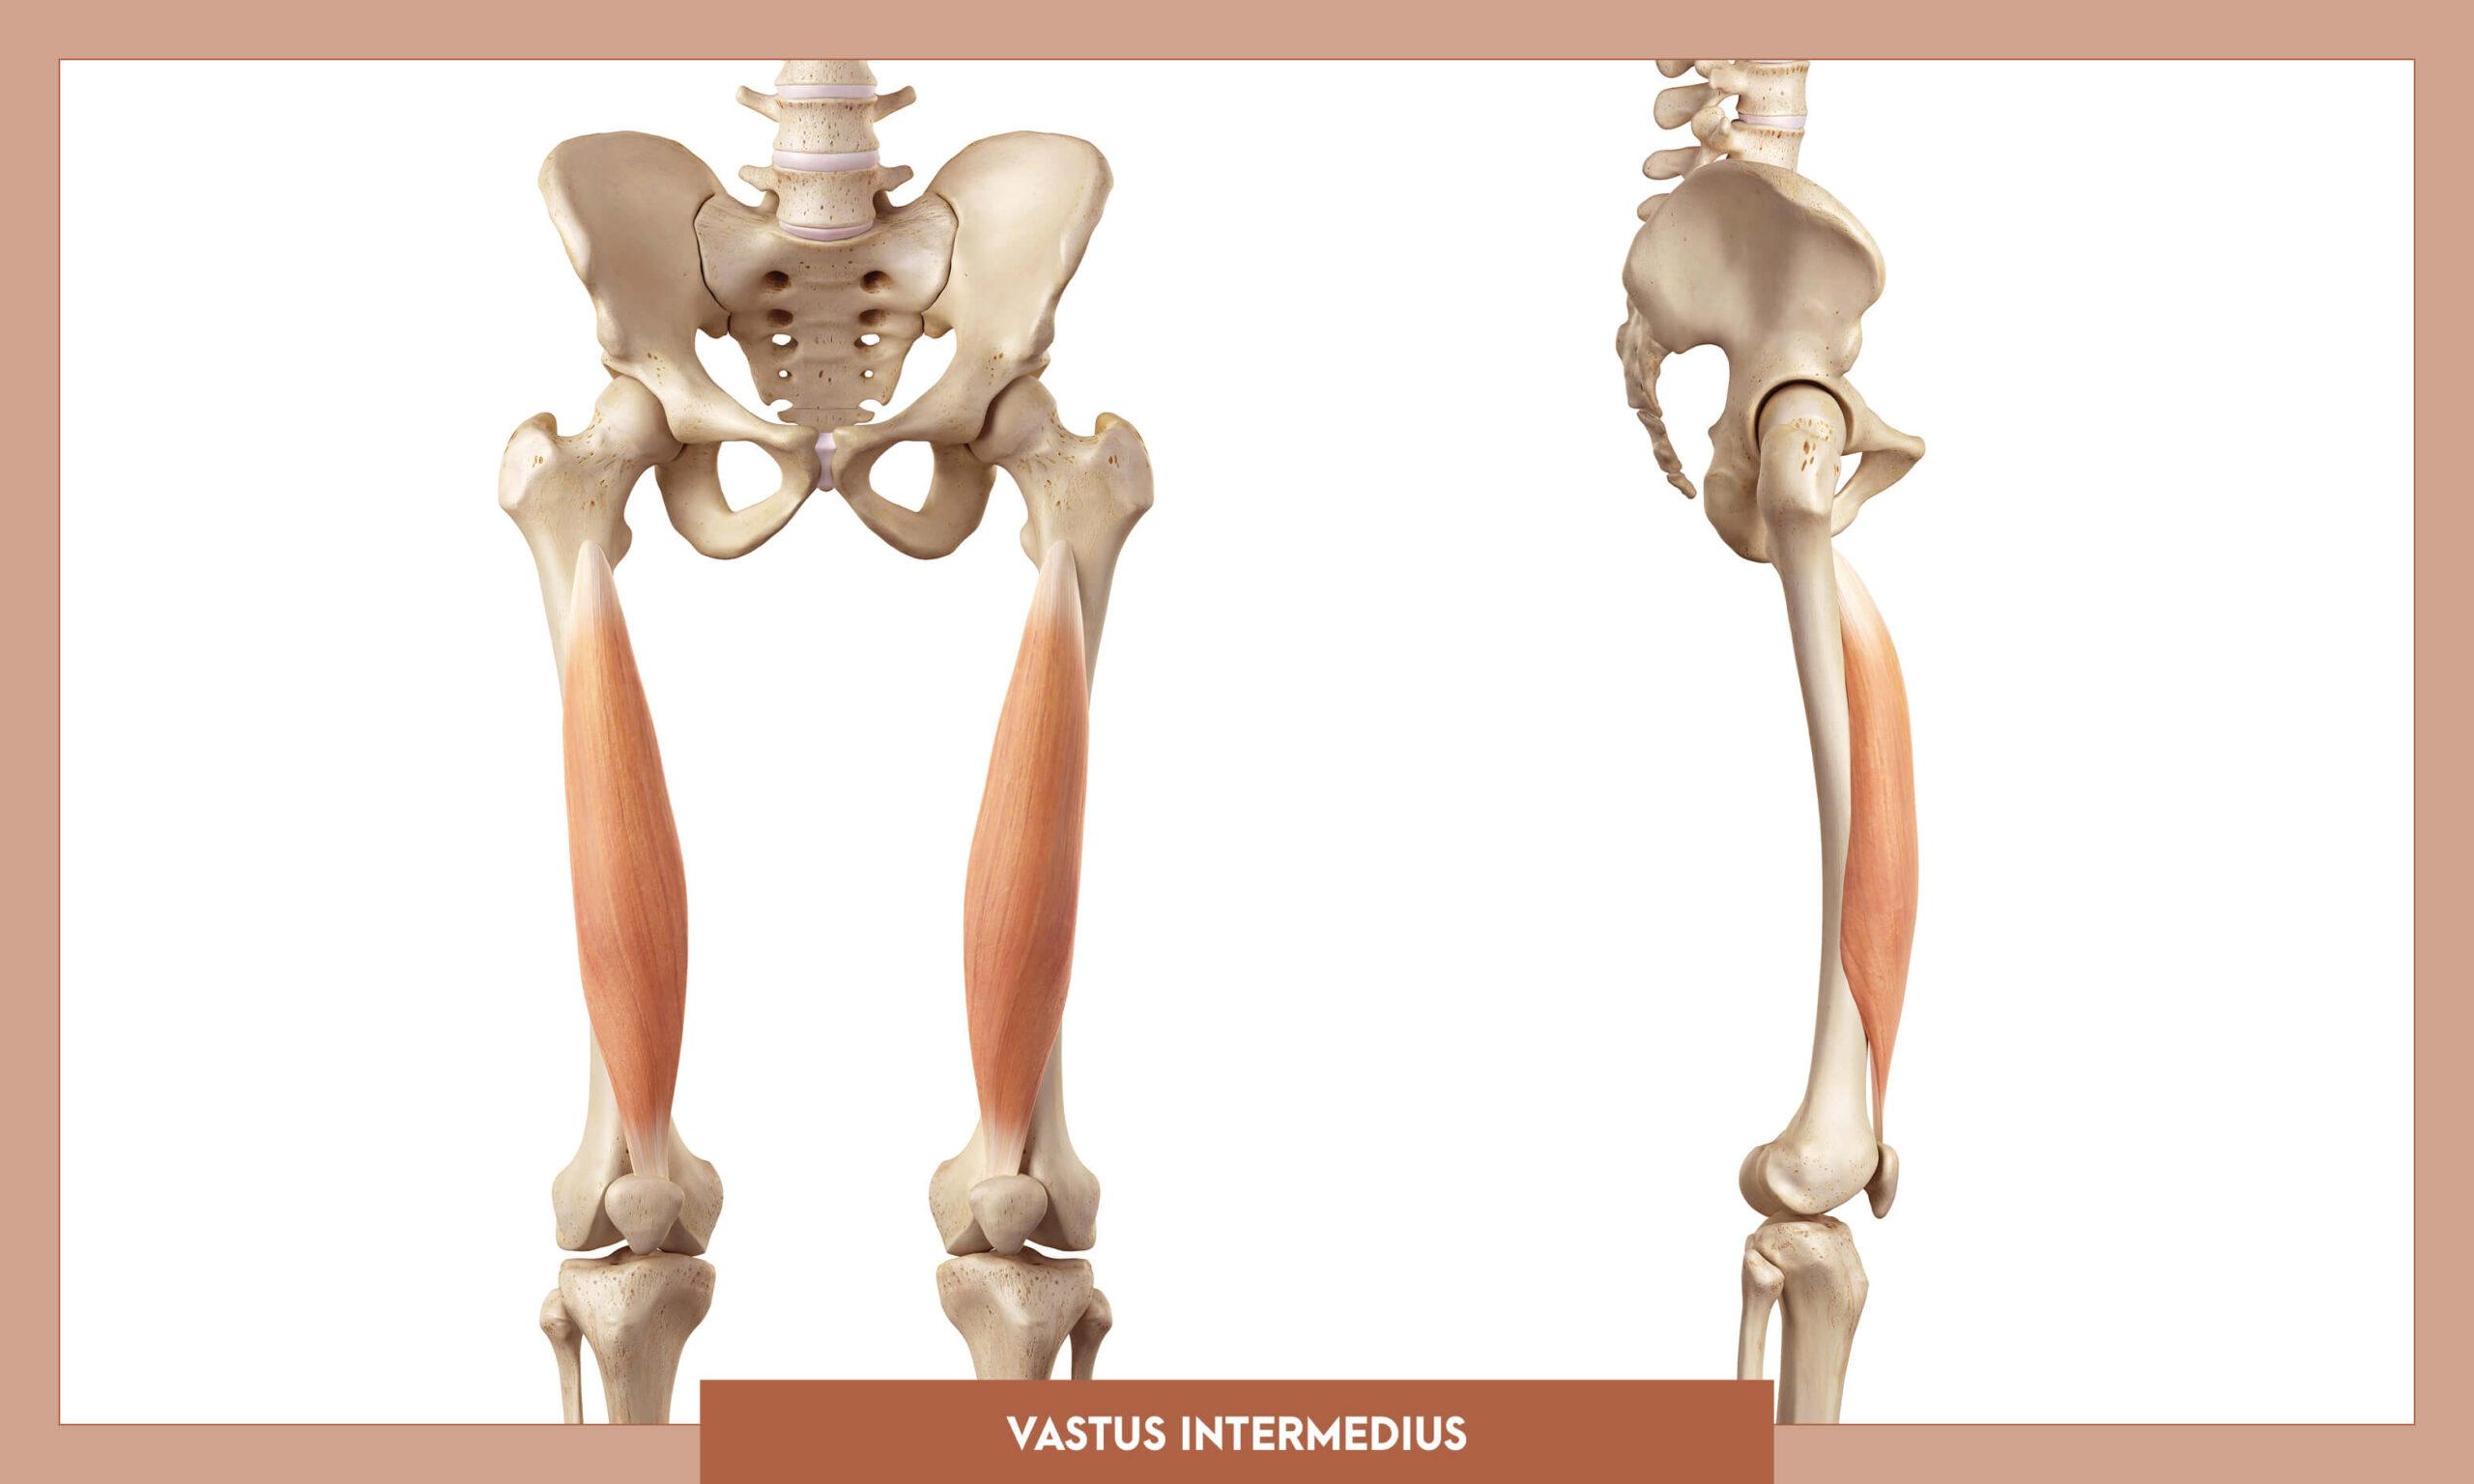 Muscles of thee Lower Limb - Vastus intermedius